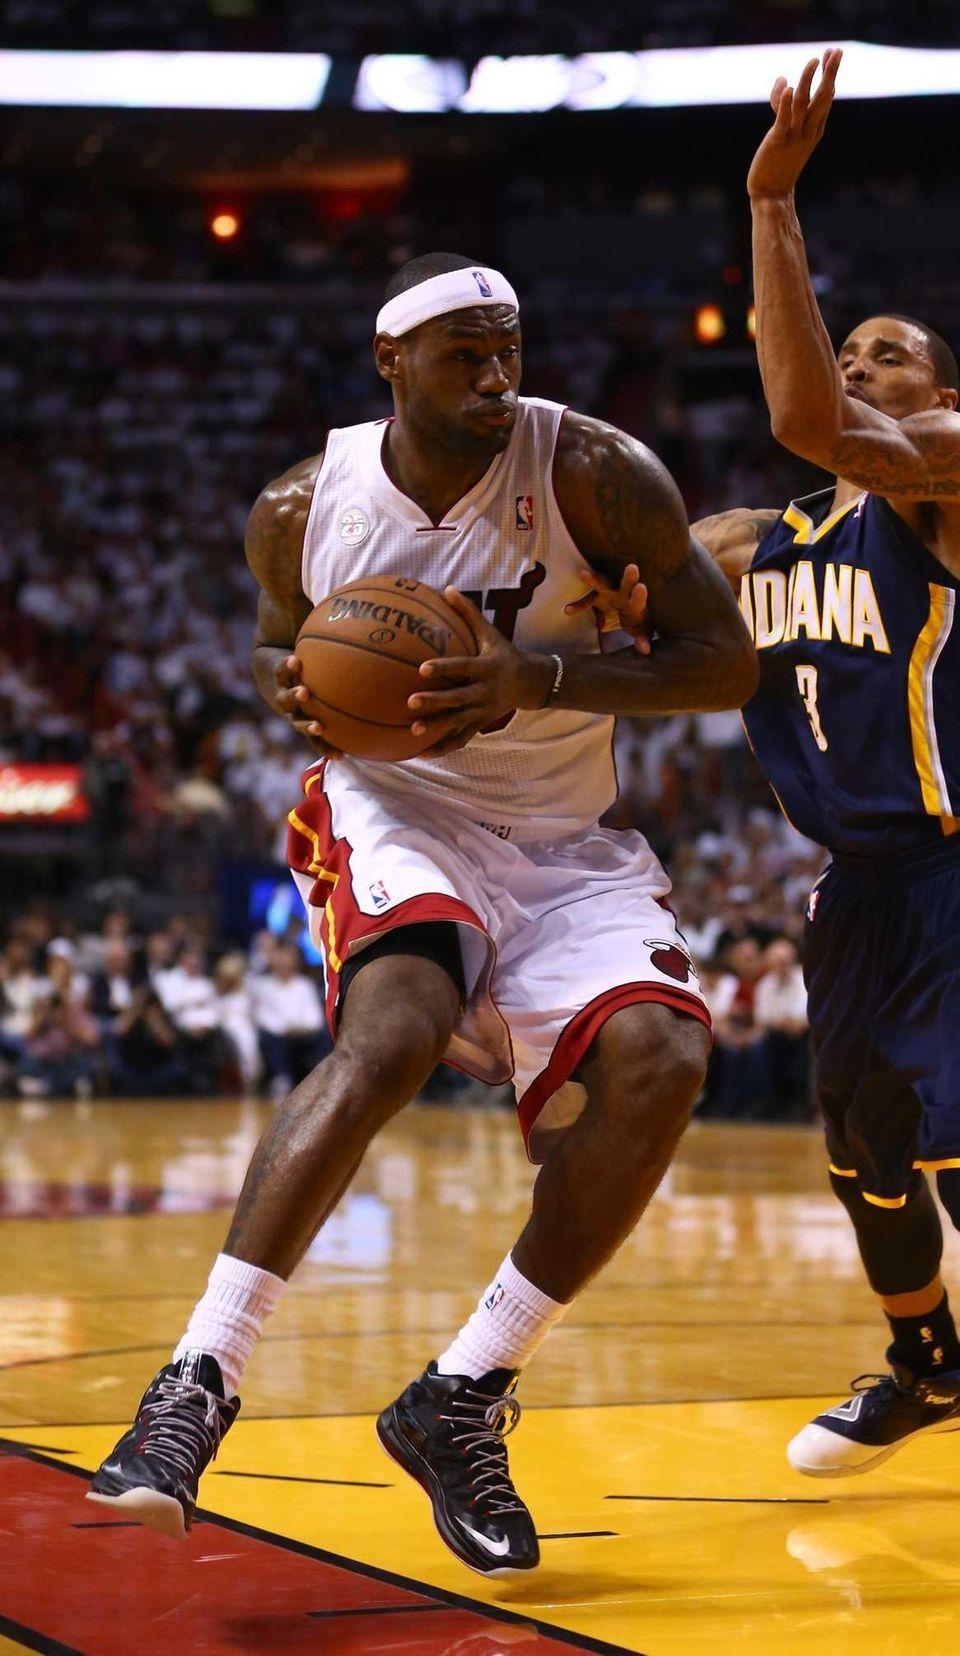 LeBron James of the Miami Heat handles the